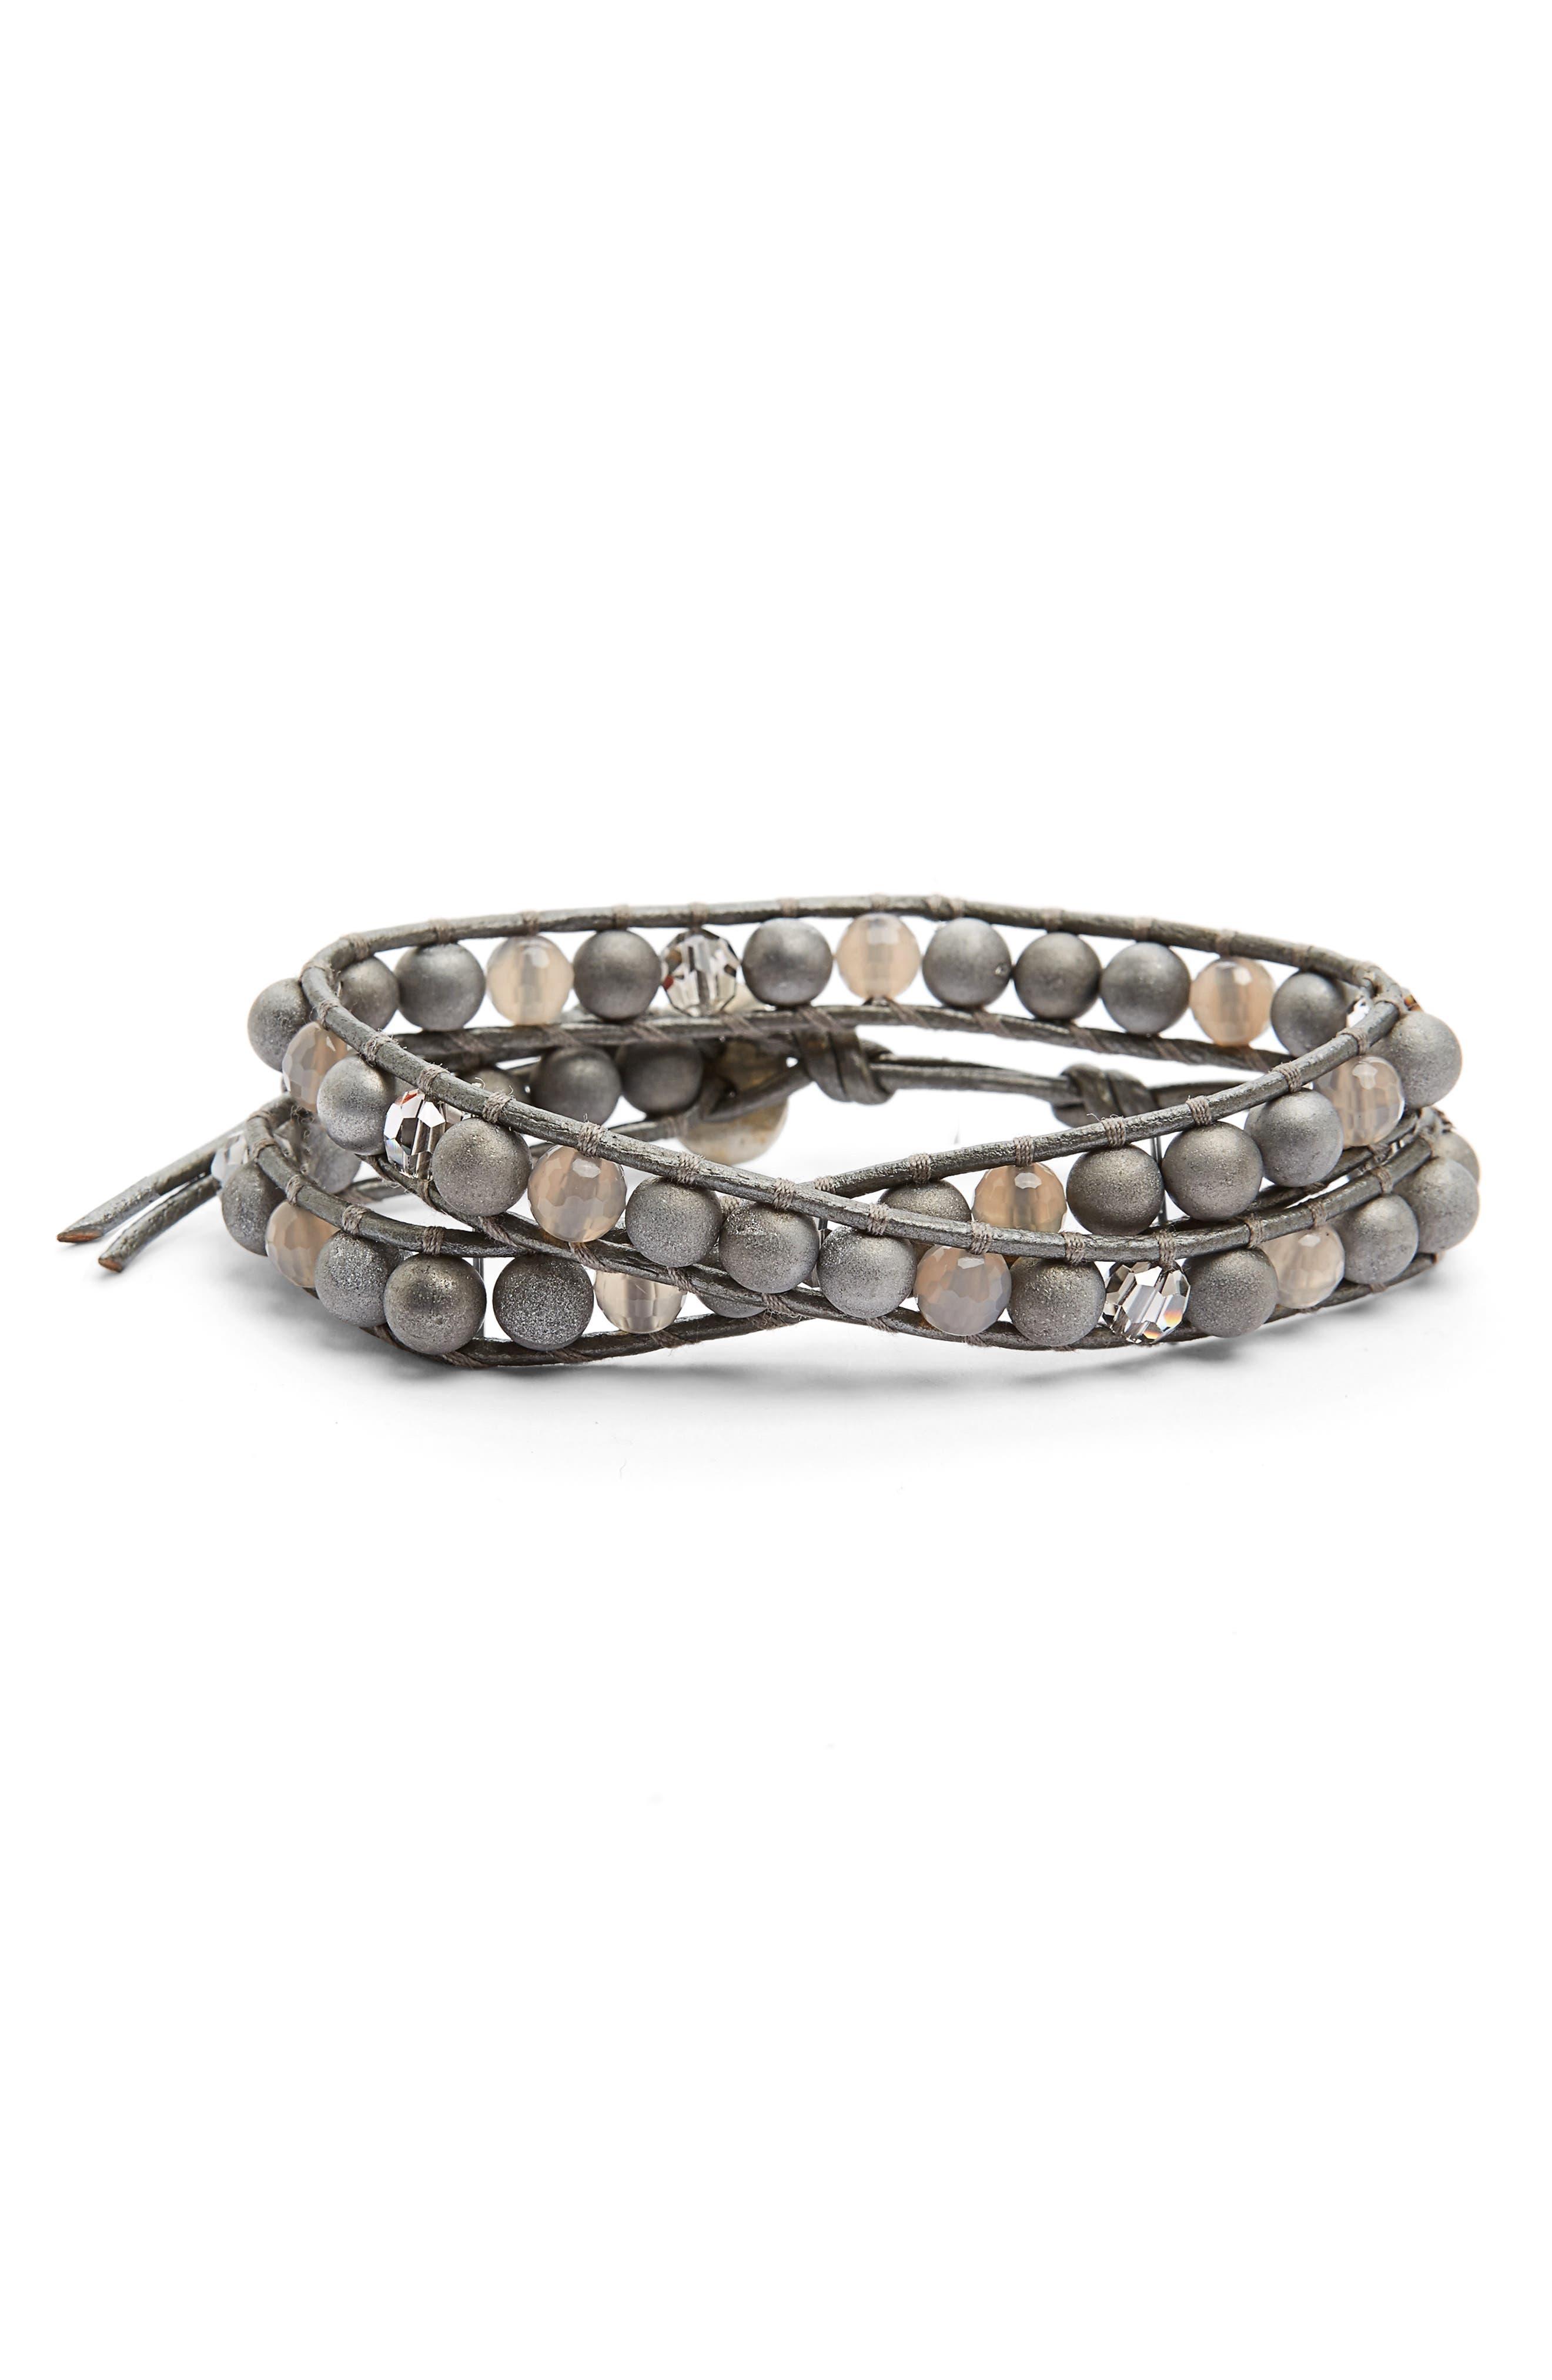 Silver Agate & Crystal Wrap Bracelet,                             Main thumbnail 1, color,